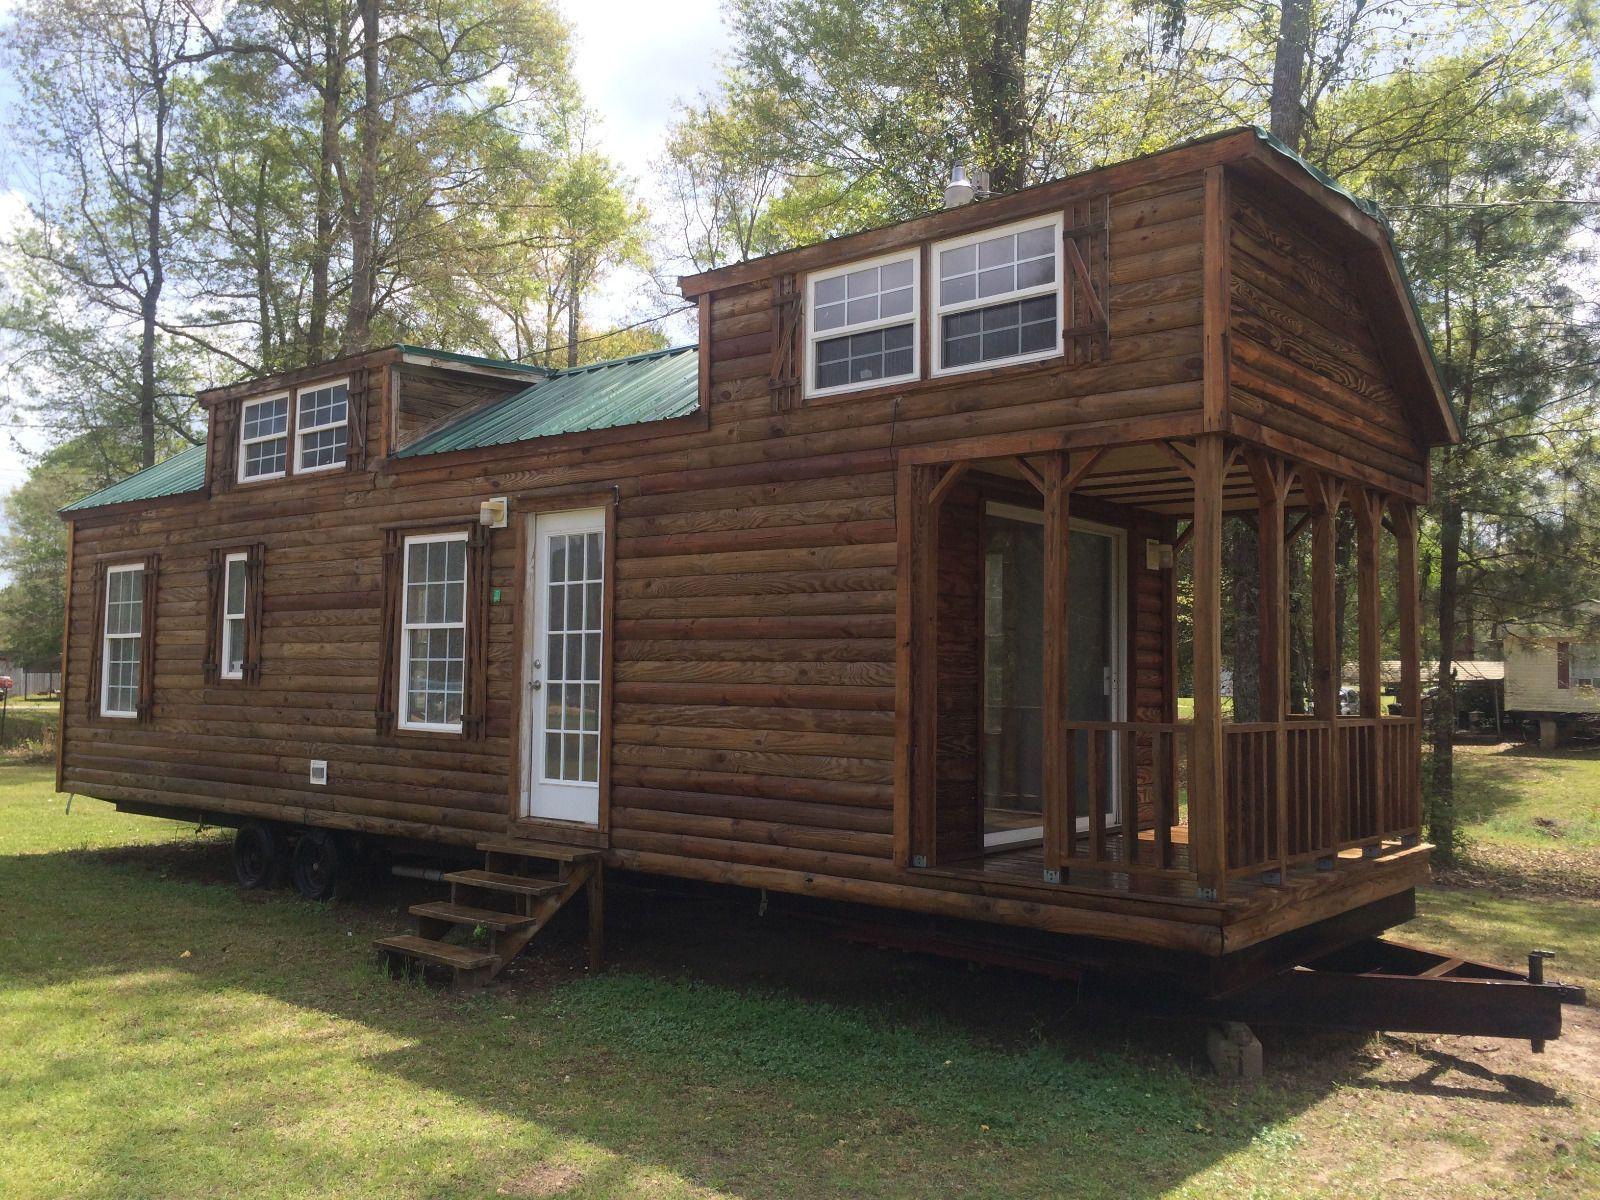 10x38 tiny house shell park model rv trailer log cabin ebay [ 1600 x 1200 Pixel ]